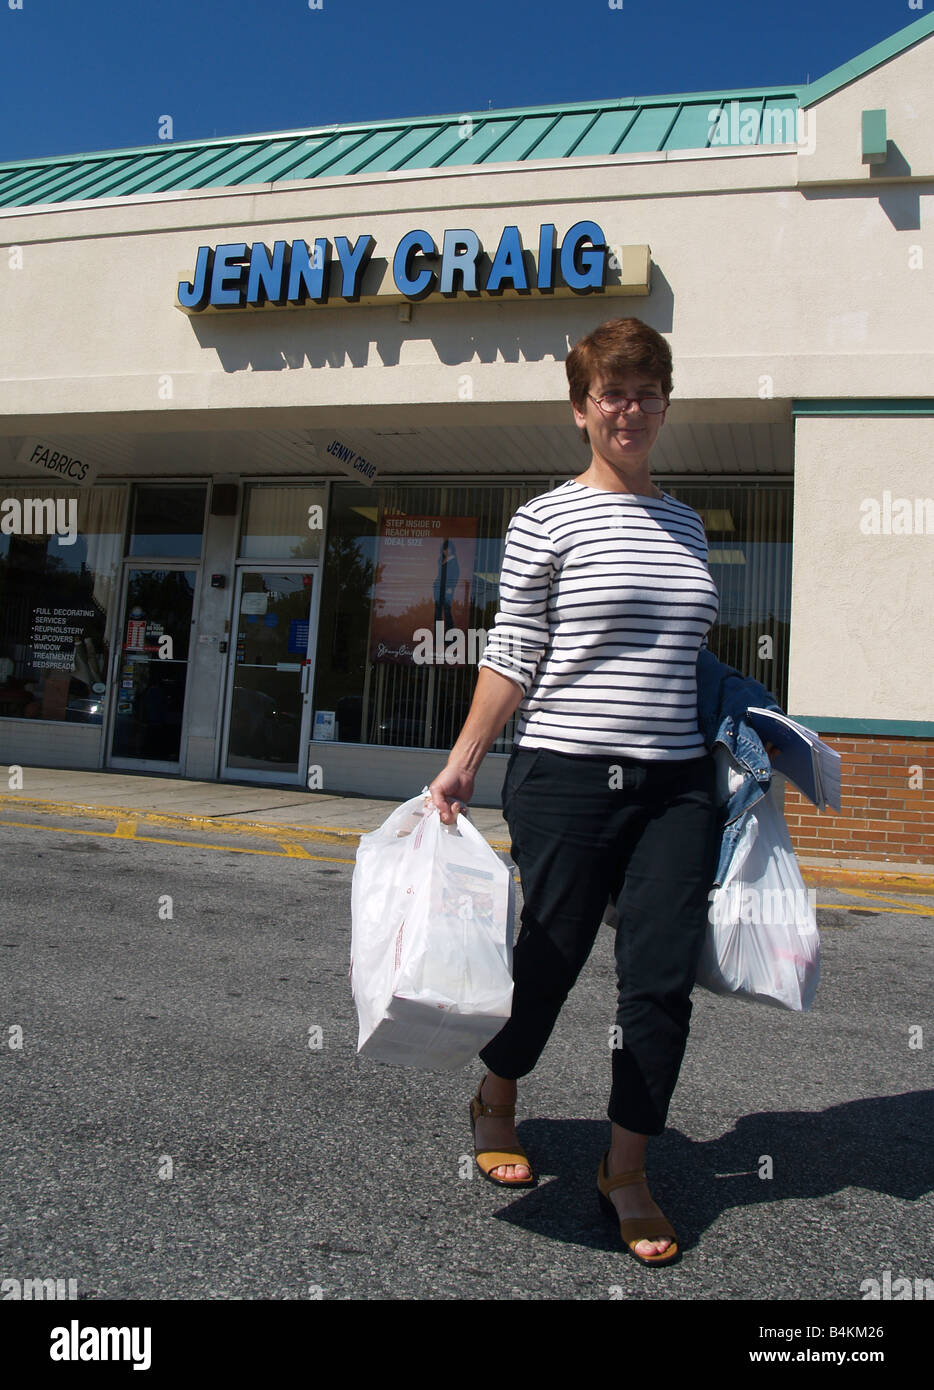 Jenny Craig Food Canada